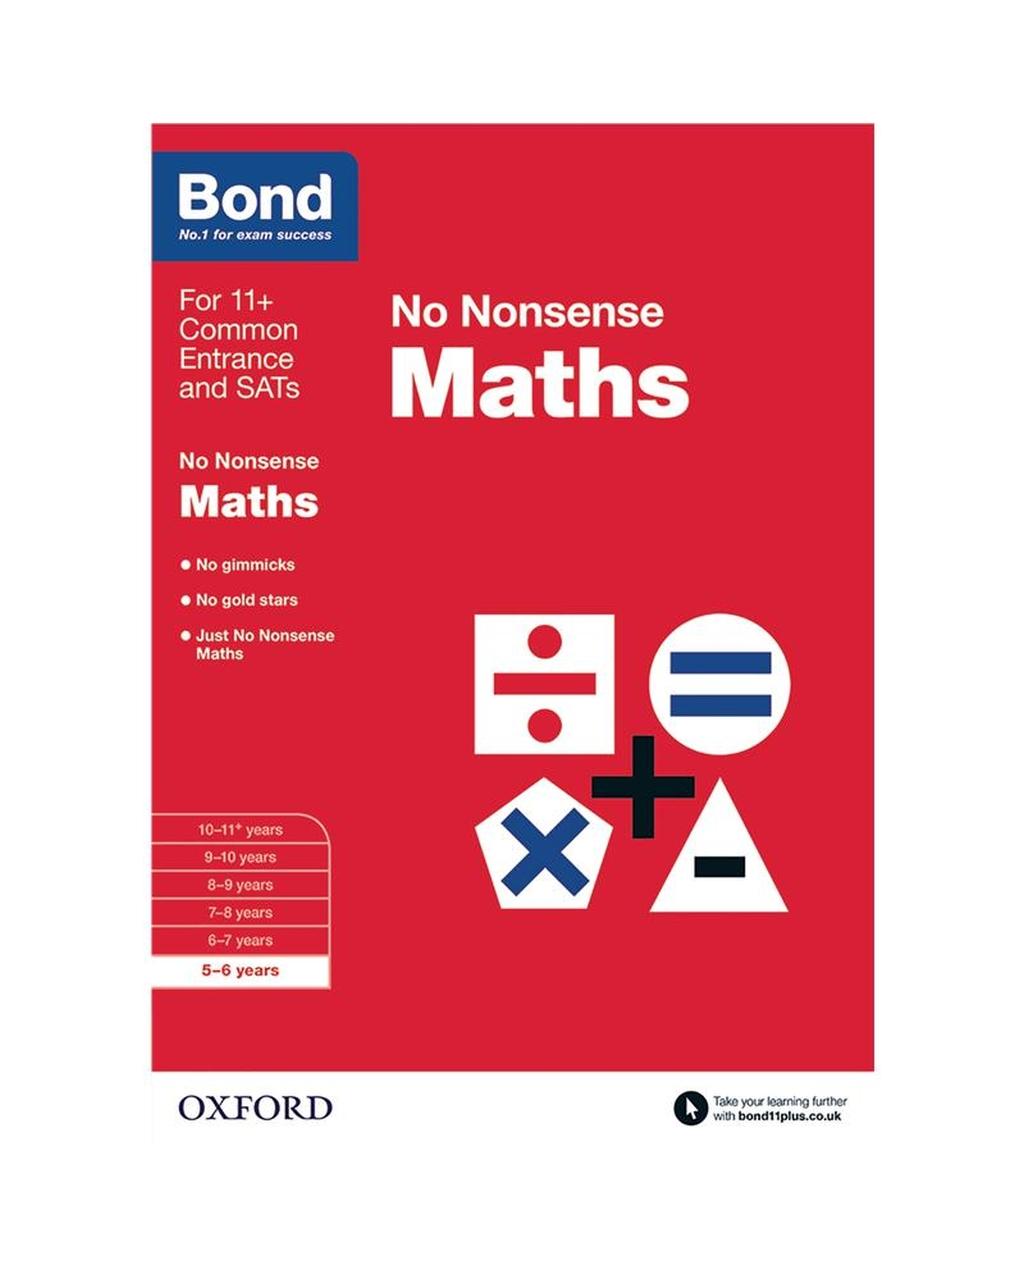 Bond: Maths No Nonsense 5-6 Years